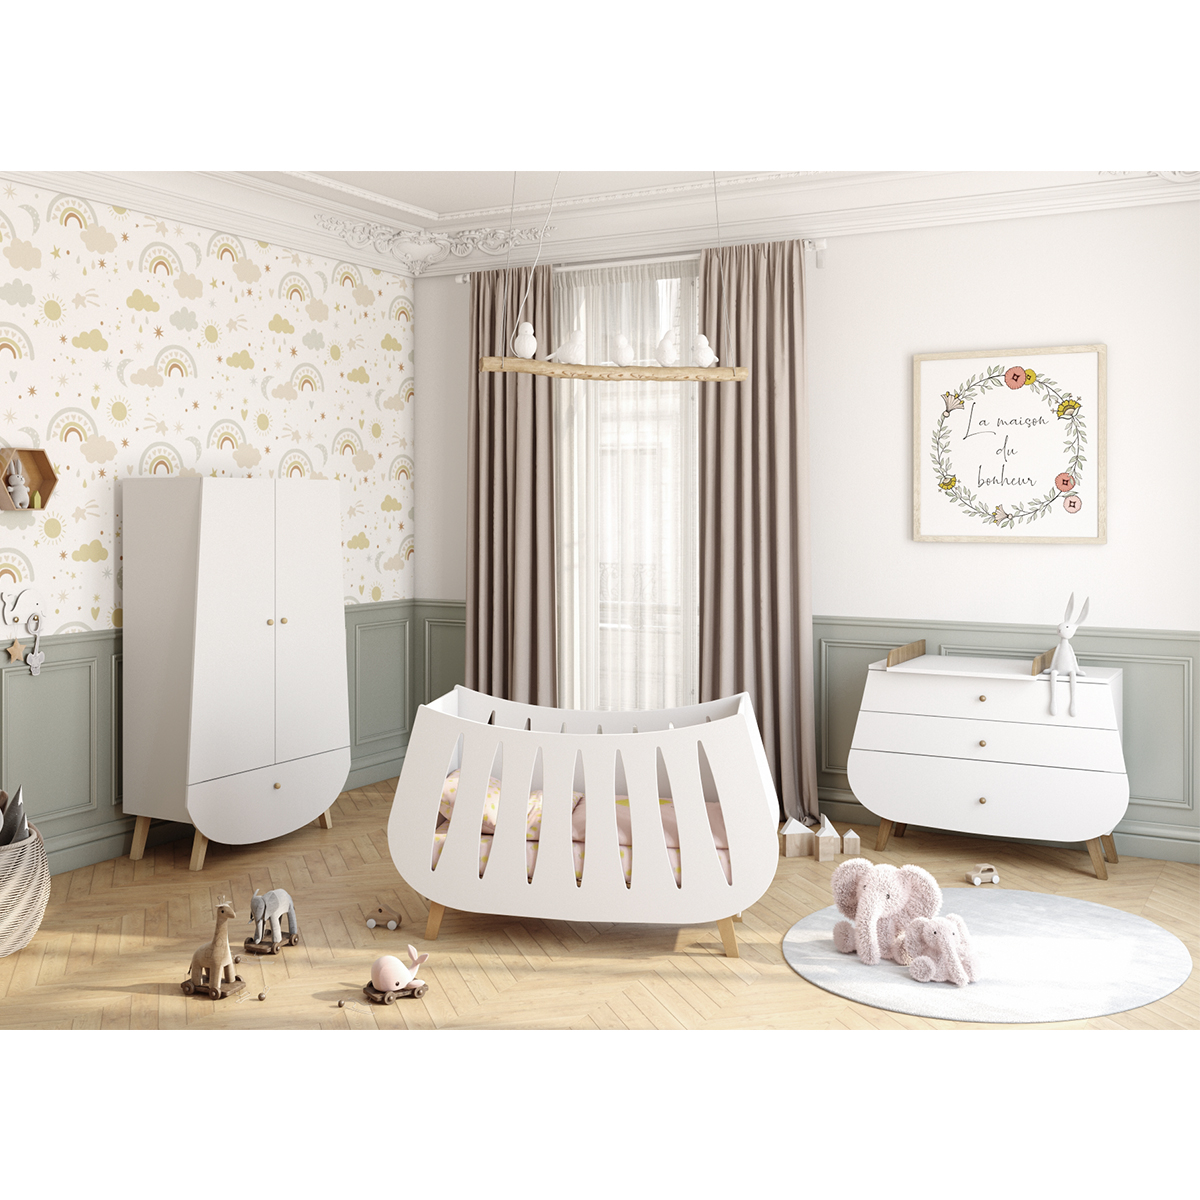 songes_et_rigolades_tendresse_bebe_trapeze_chambre_complete_bebe_lit_commode_armoire_blanc_1